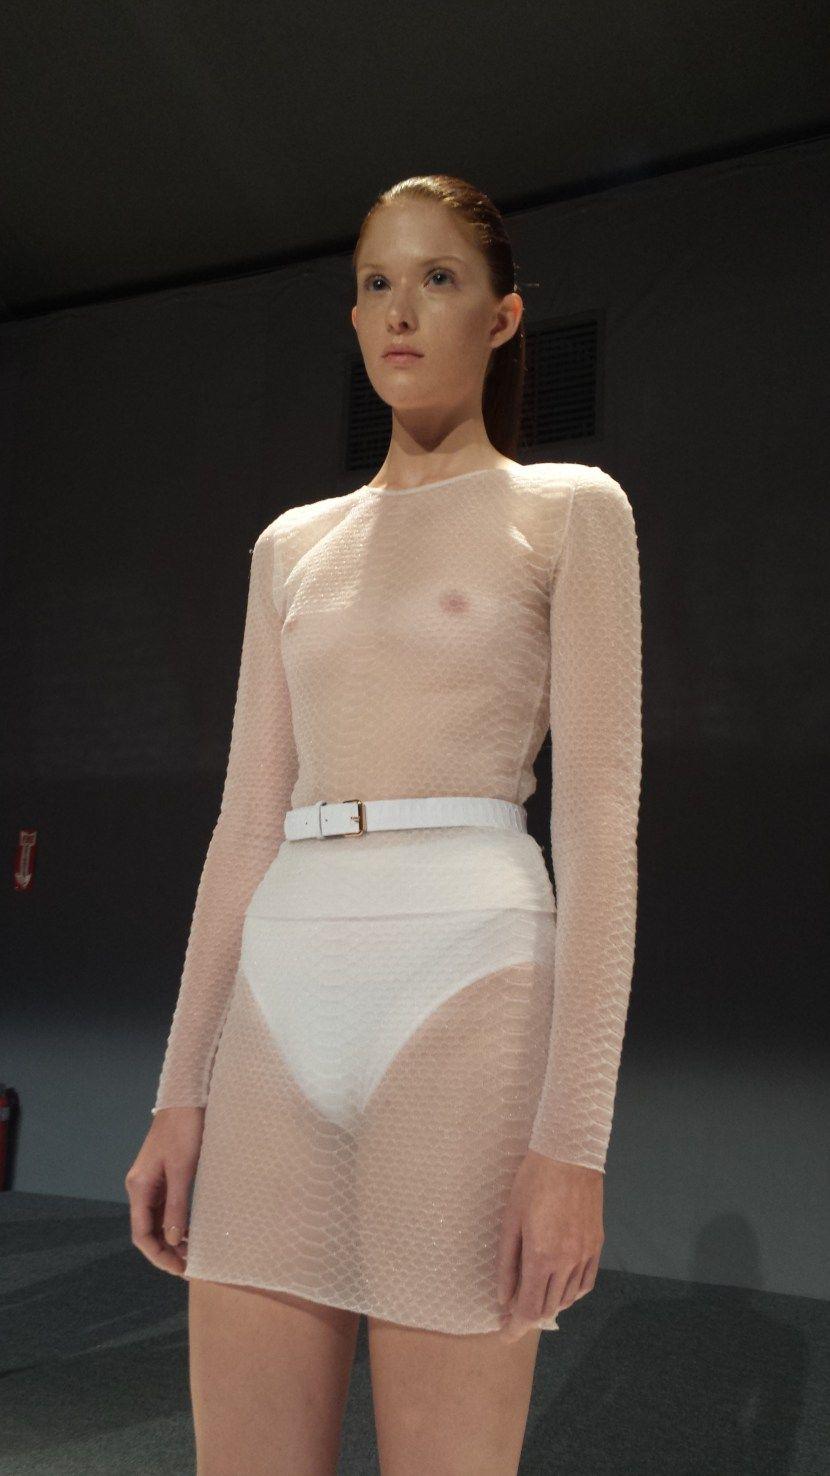 NSFW Fashion Week Trend: Sheer Shirts With No Bra